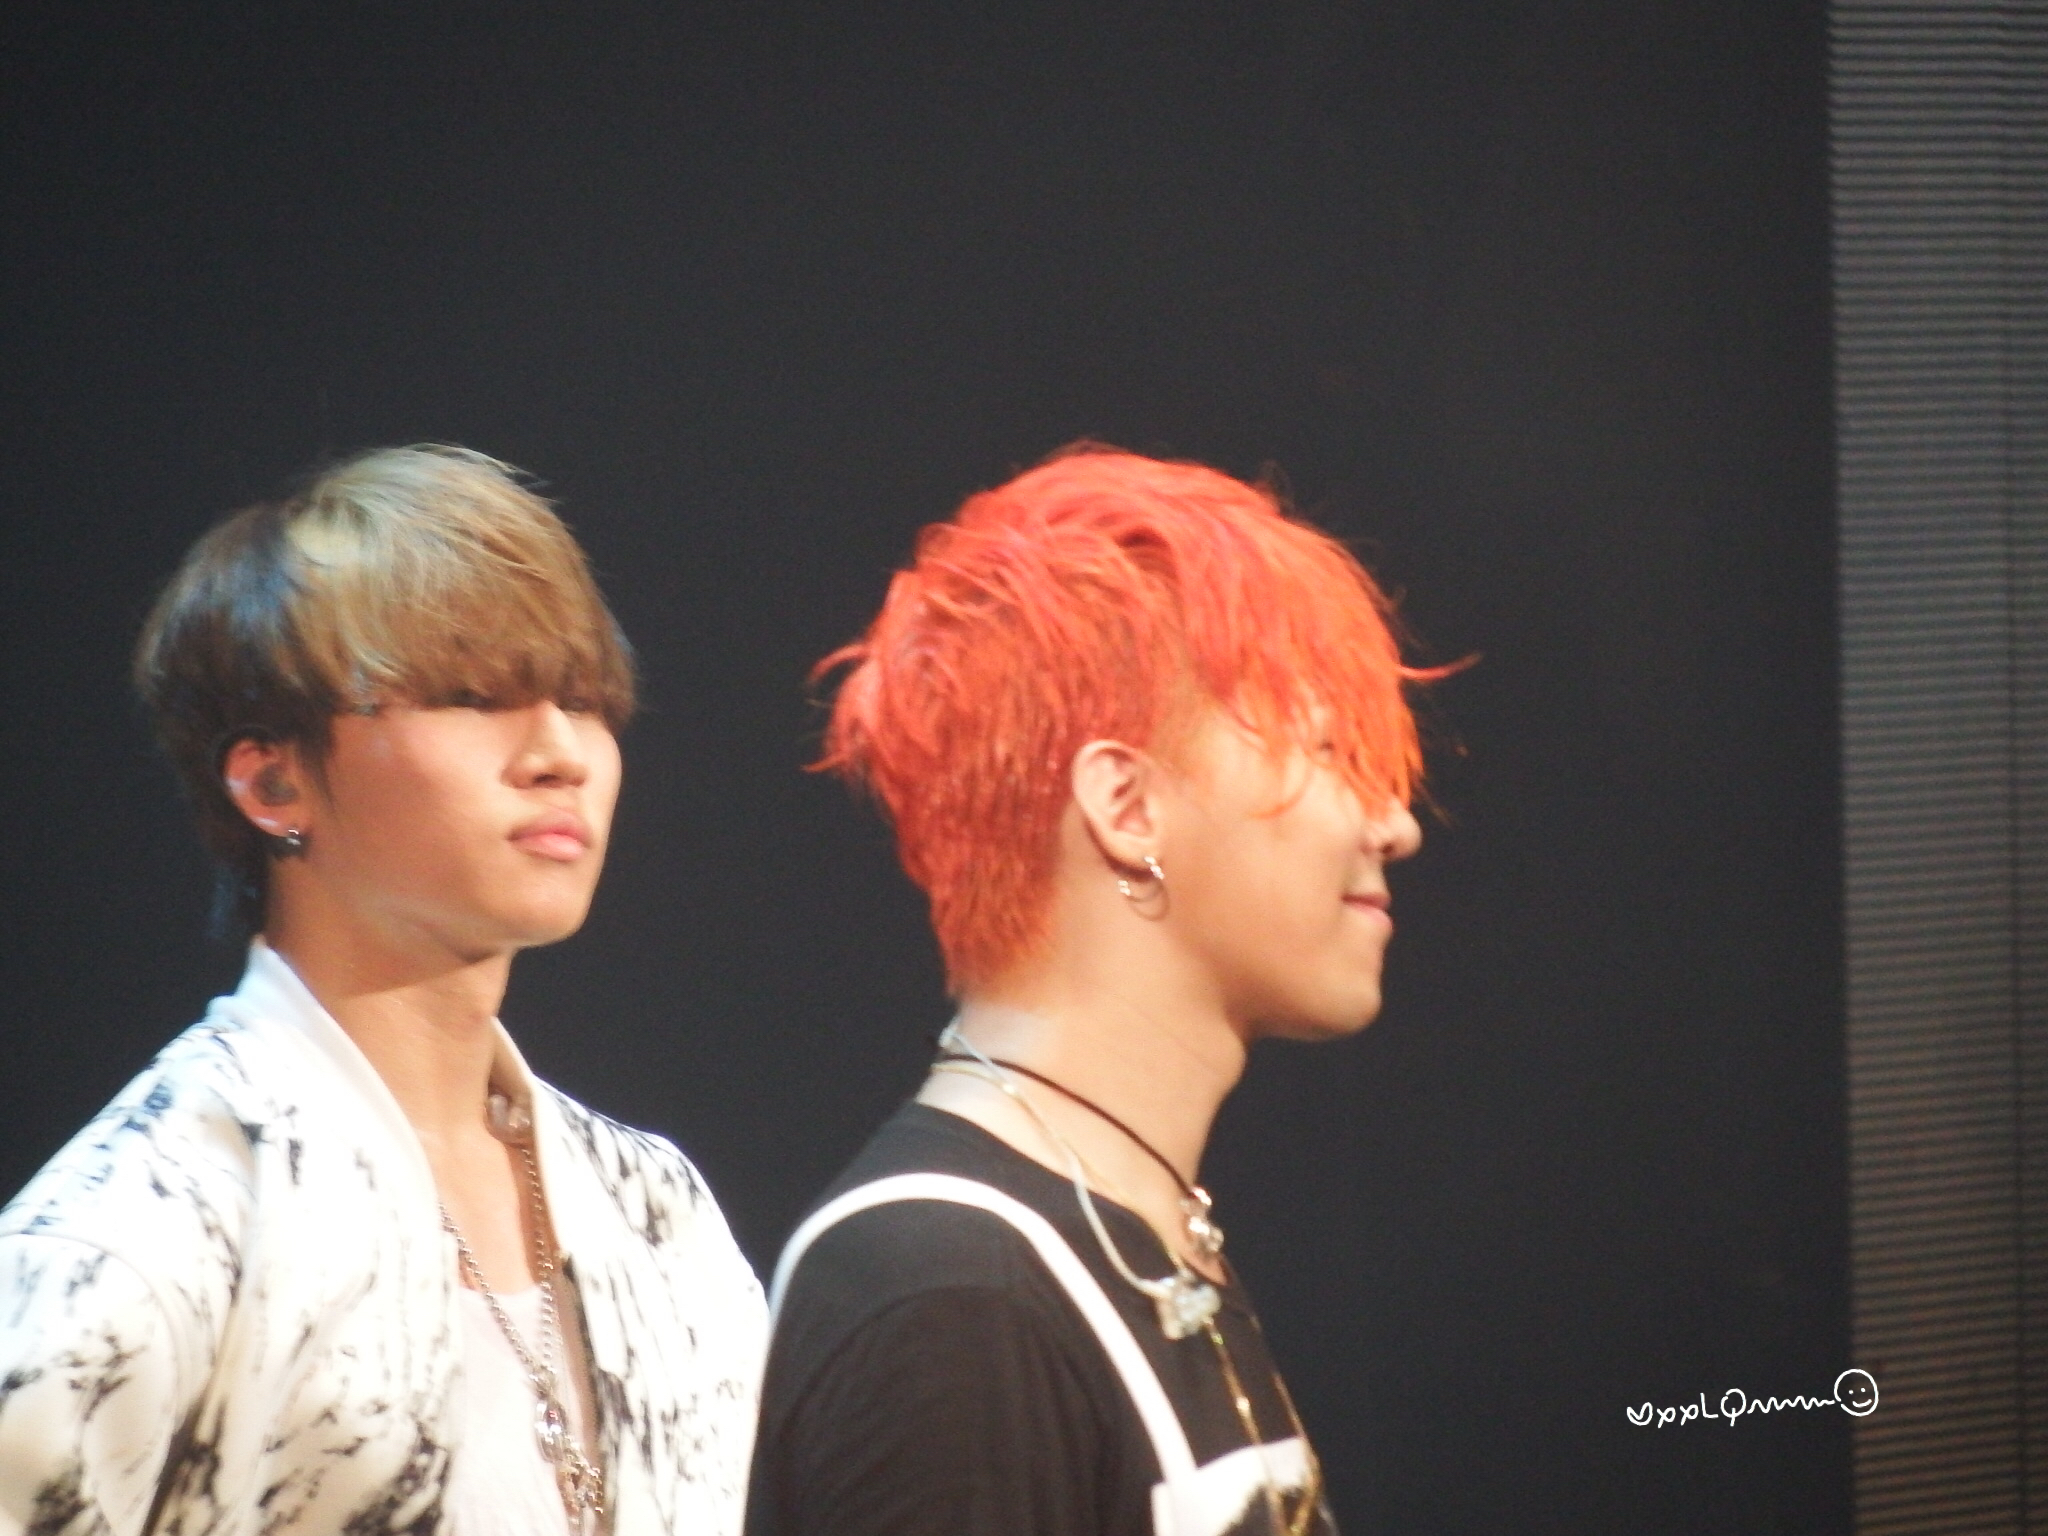 BIGBANG - Made Tour 2015 - Shanghai - 19jun2015 - xxLQmm - 13.jpg